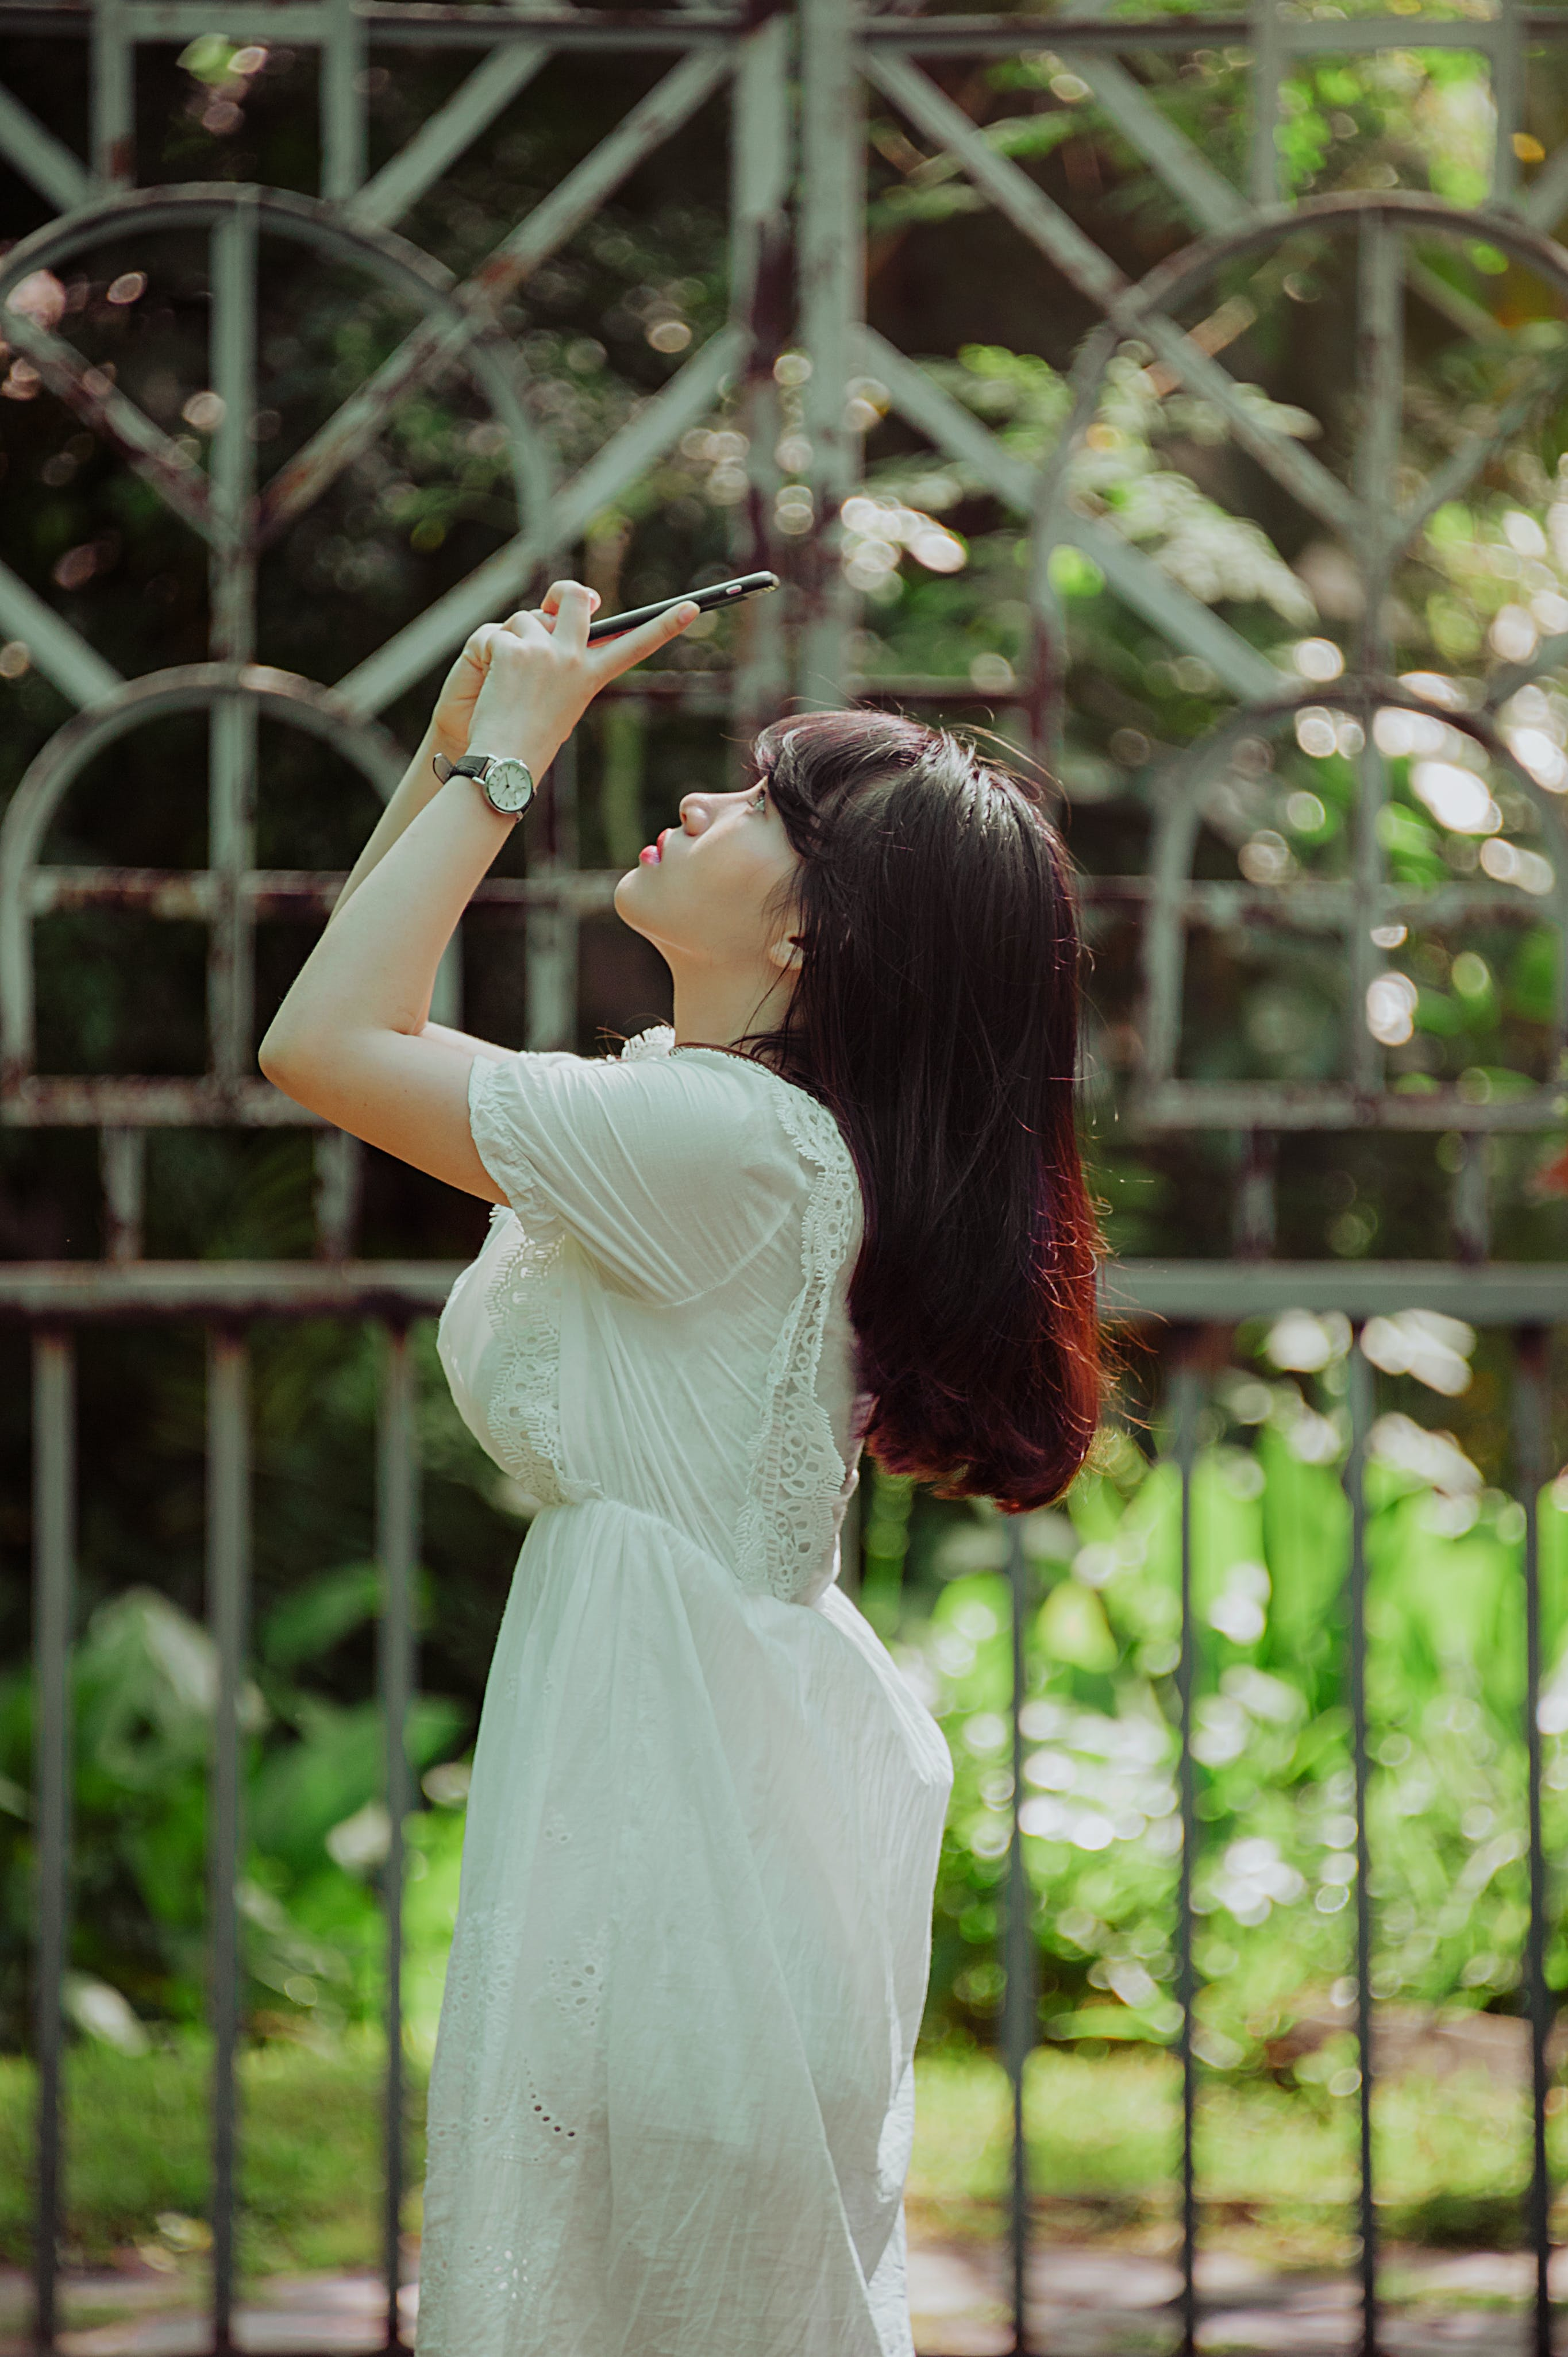 Kostenloses Stock Foto zu fashion, frau, mädchen, model